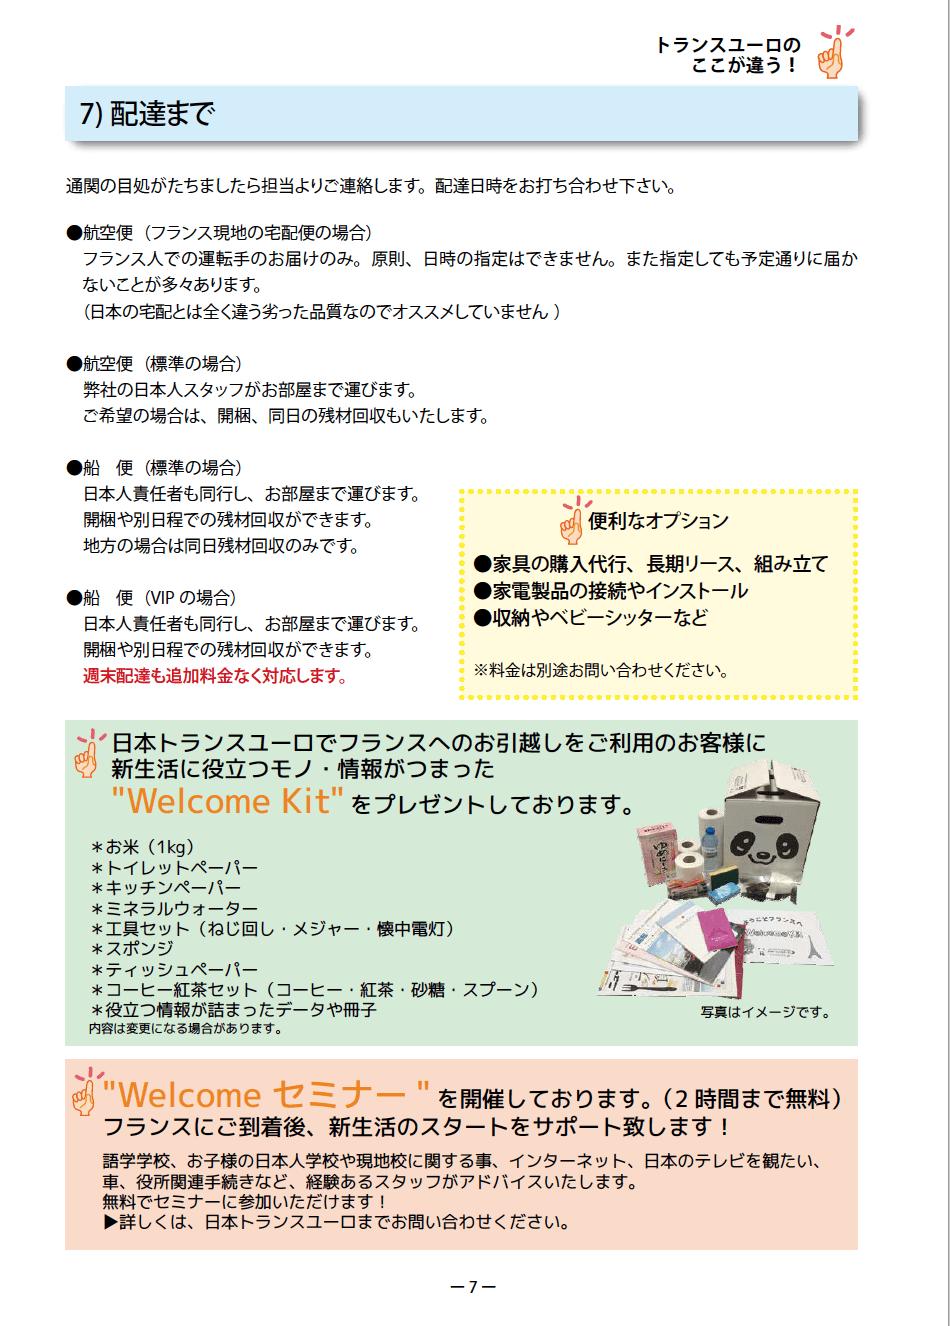 brochure_Transeuro_from_japan_09